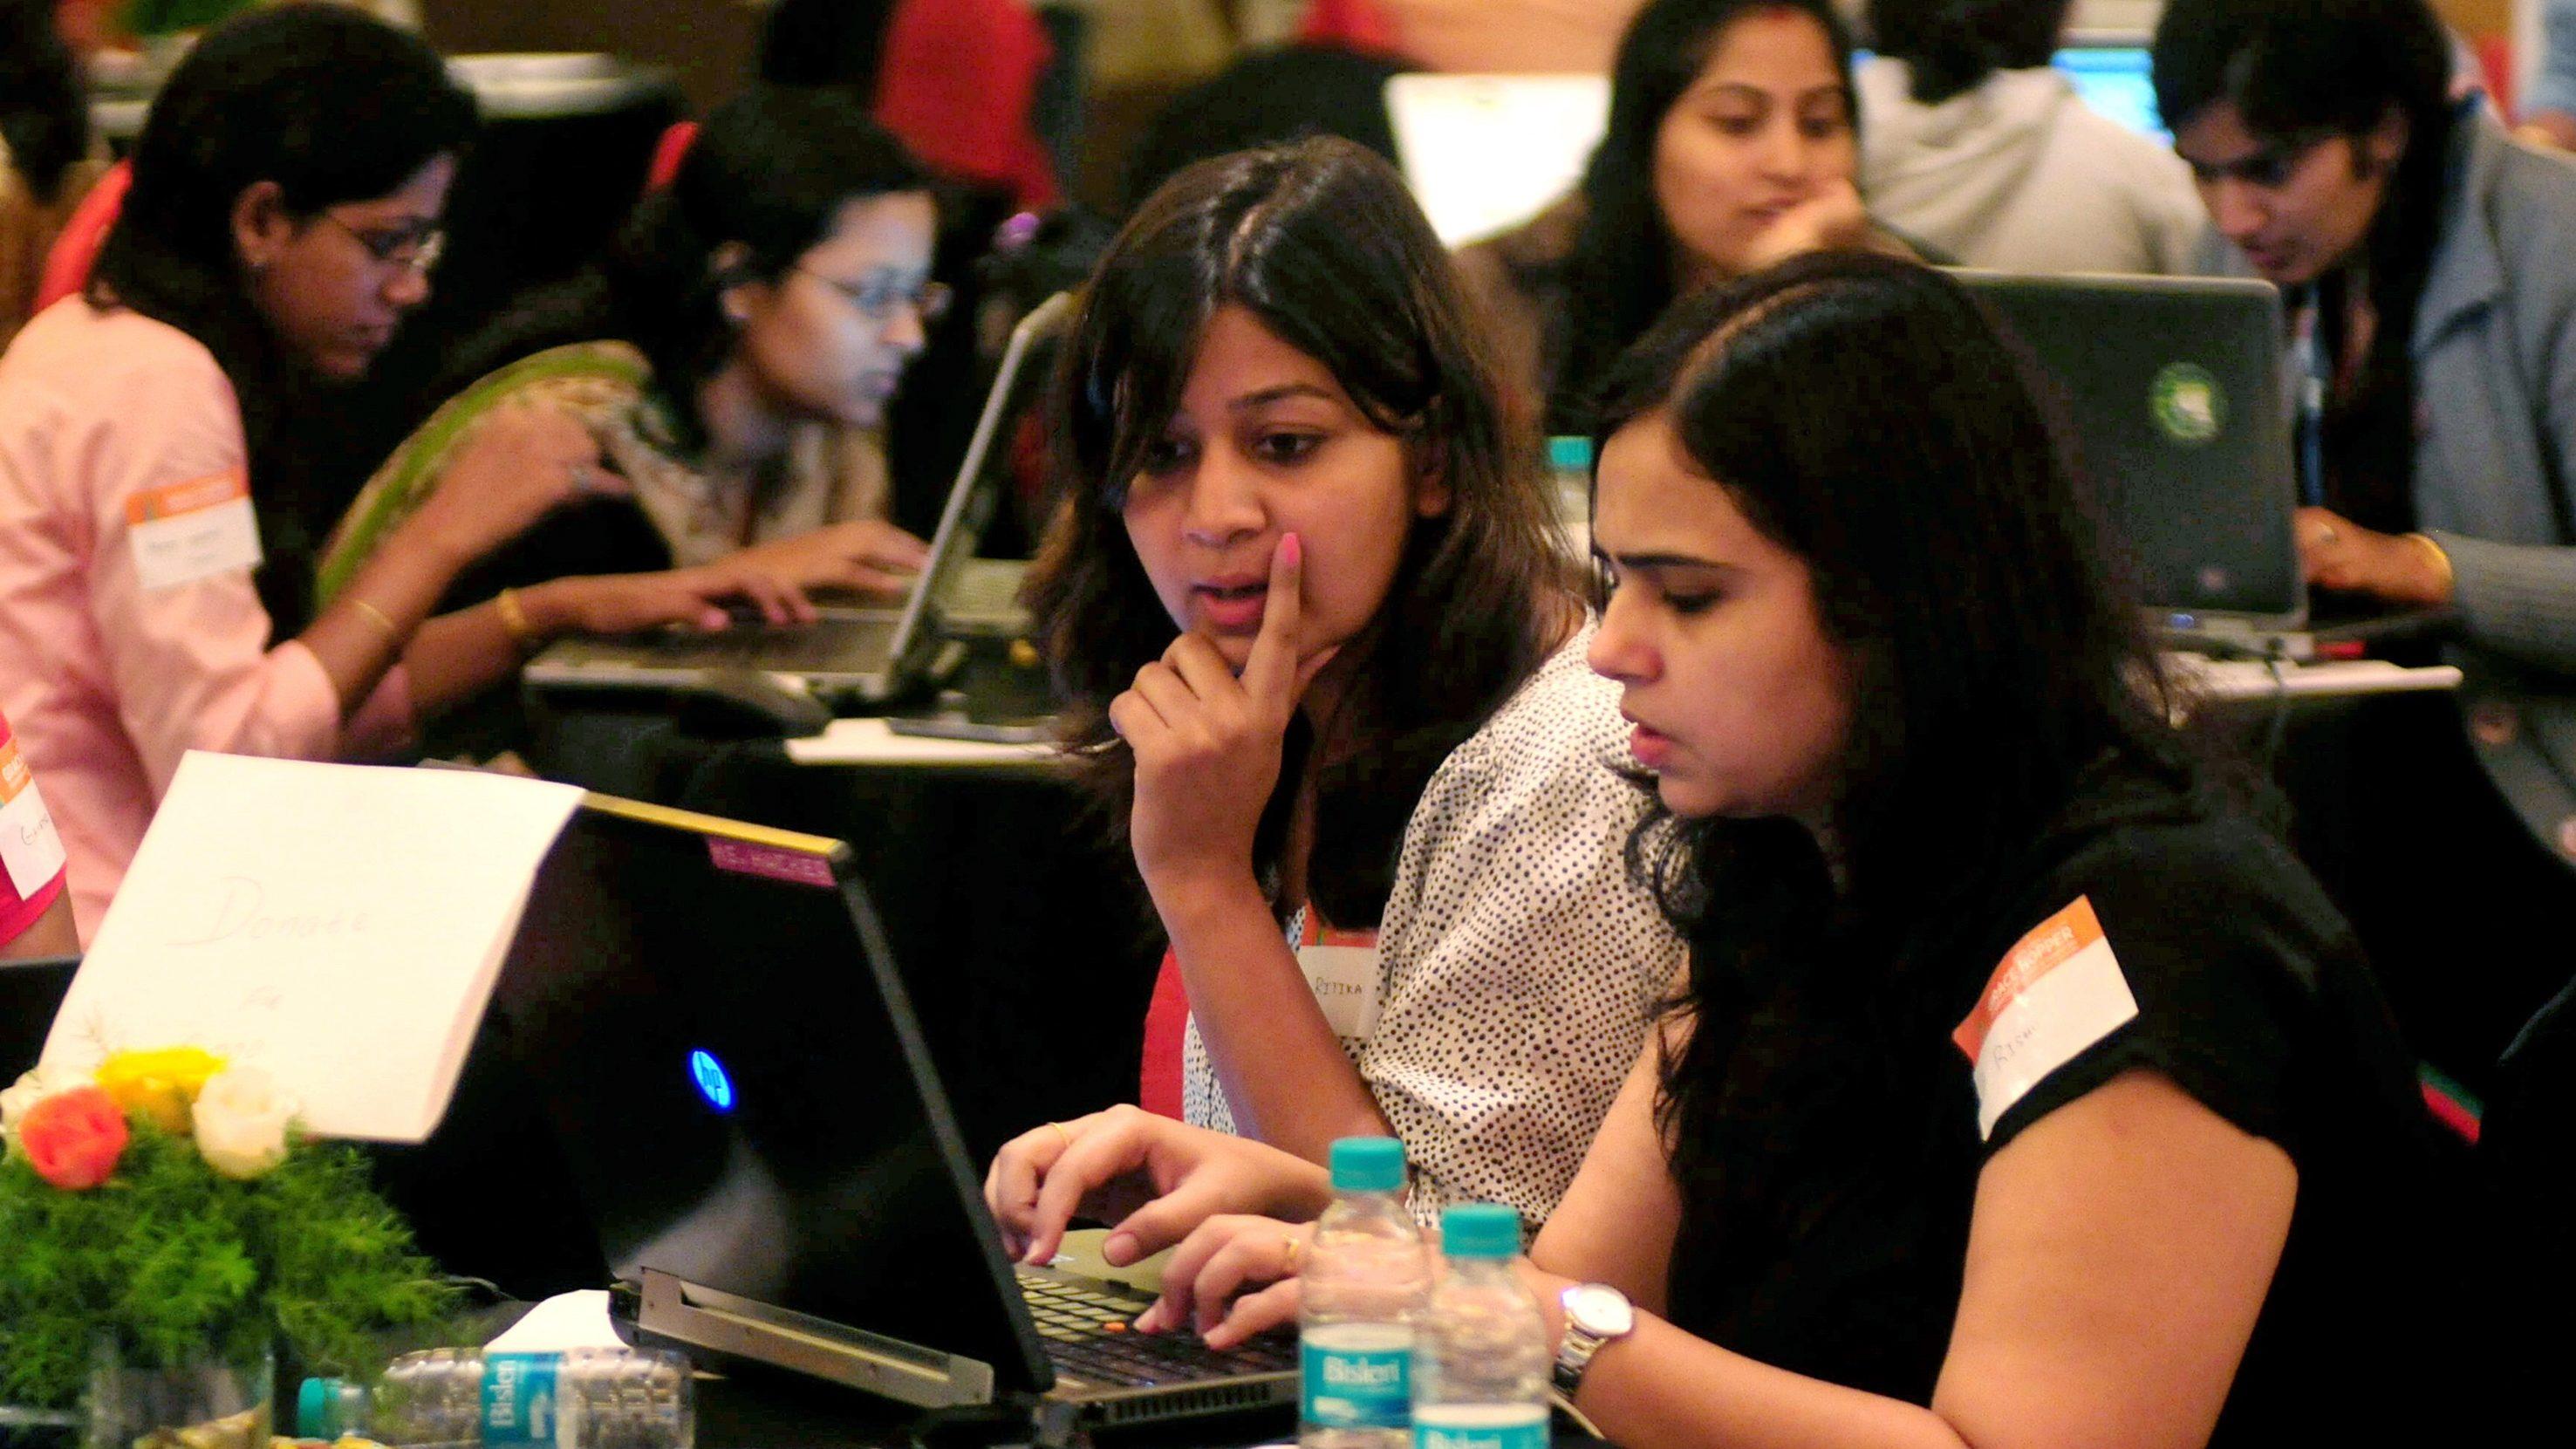 Indian women participate in Hackathon